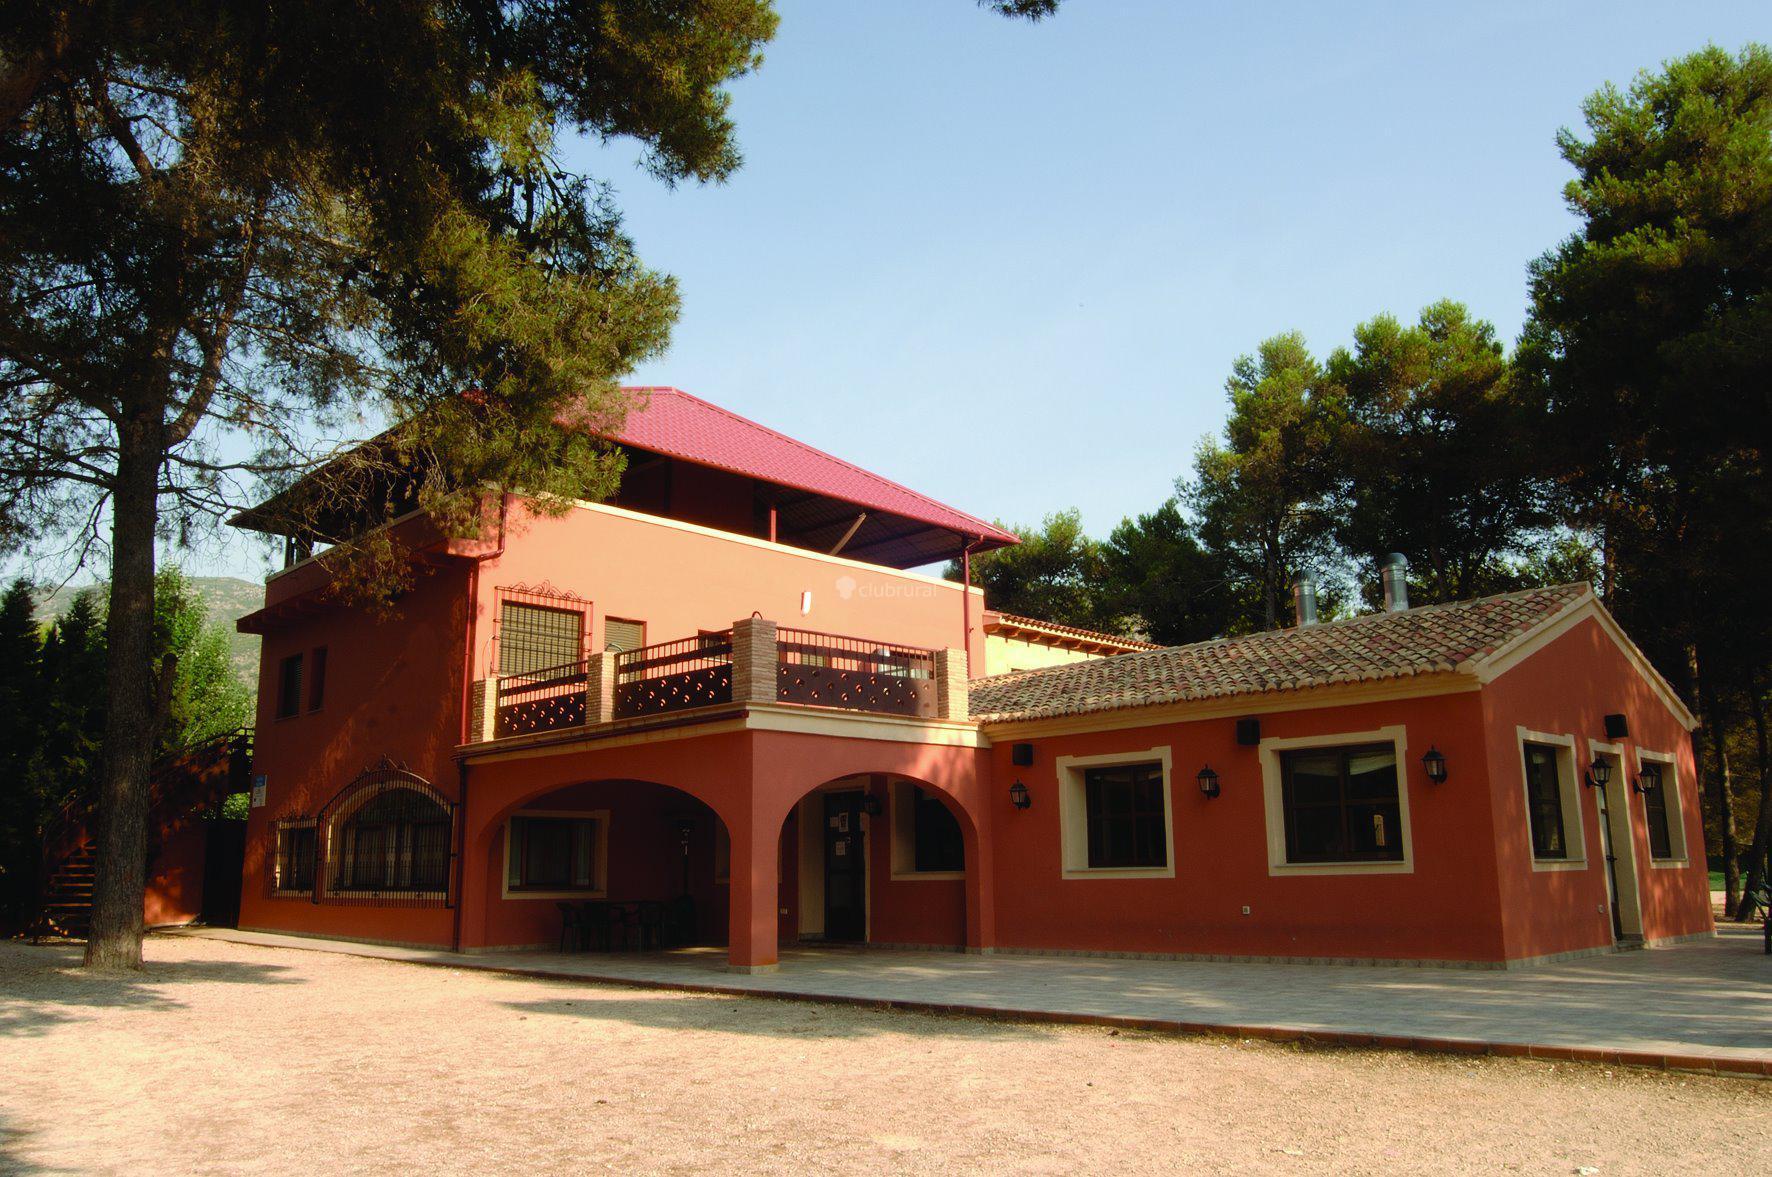 Fotos de hotel rural bonestar valencia villalonga clubrural - Ofertas casas rurales valencia ...